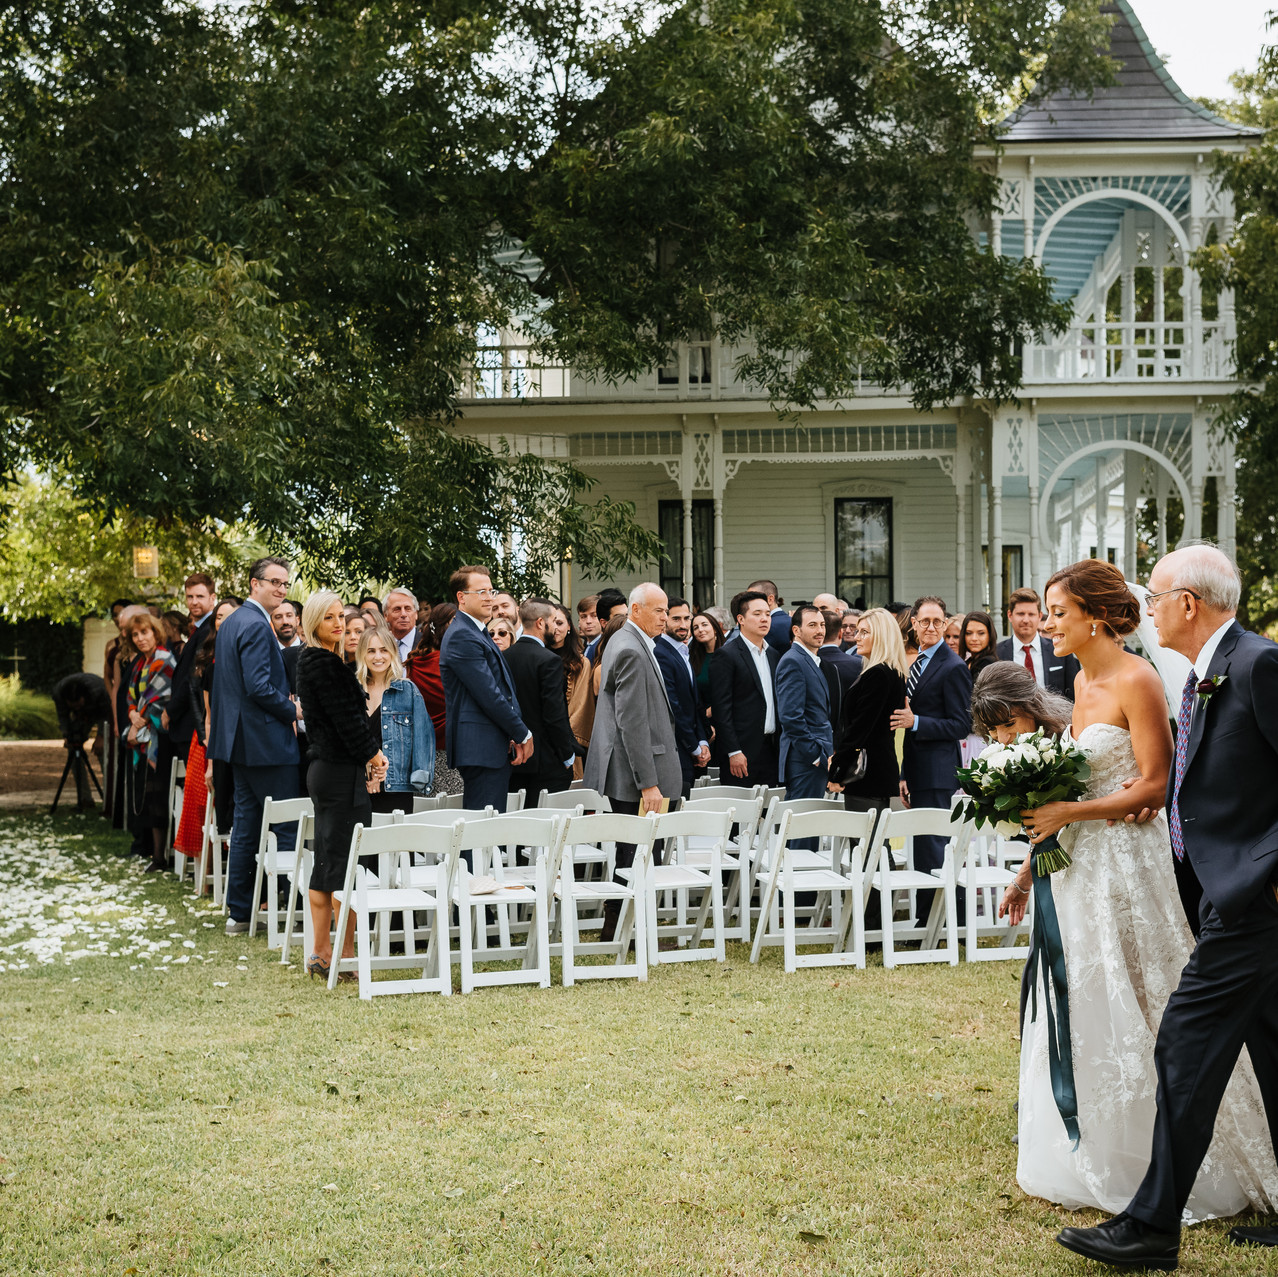 36-Ozer-Gati Wedding-Barr Mansion Jewish